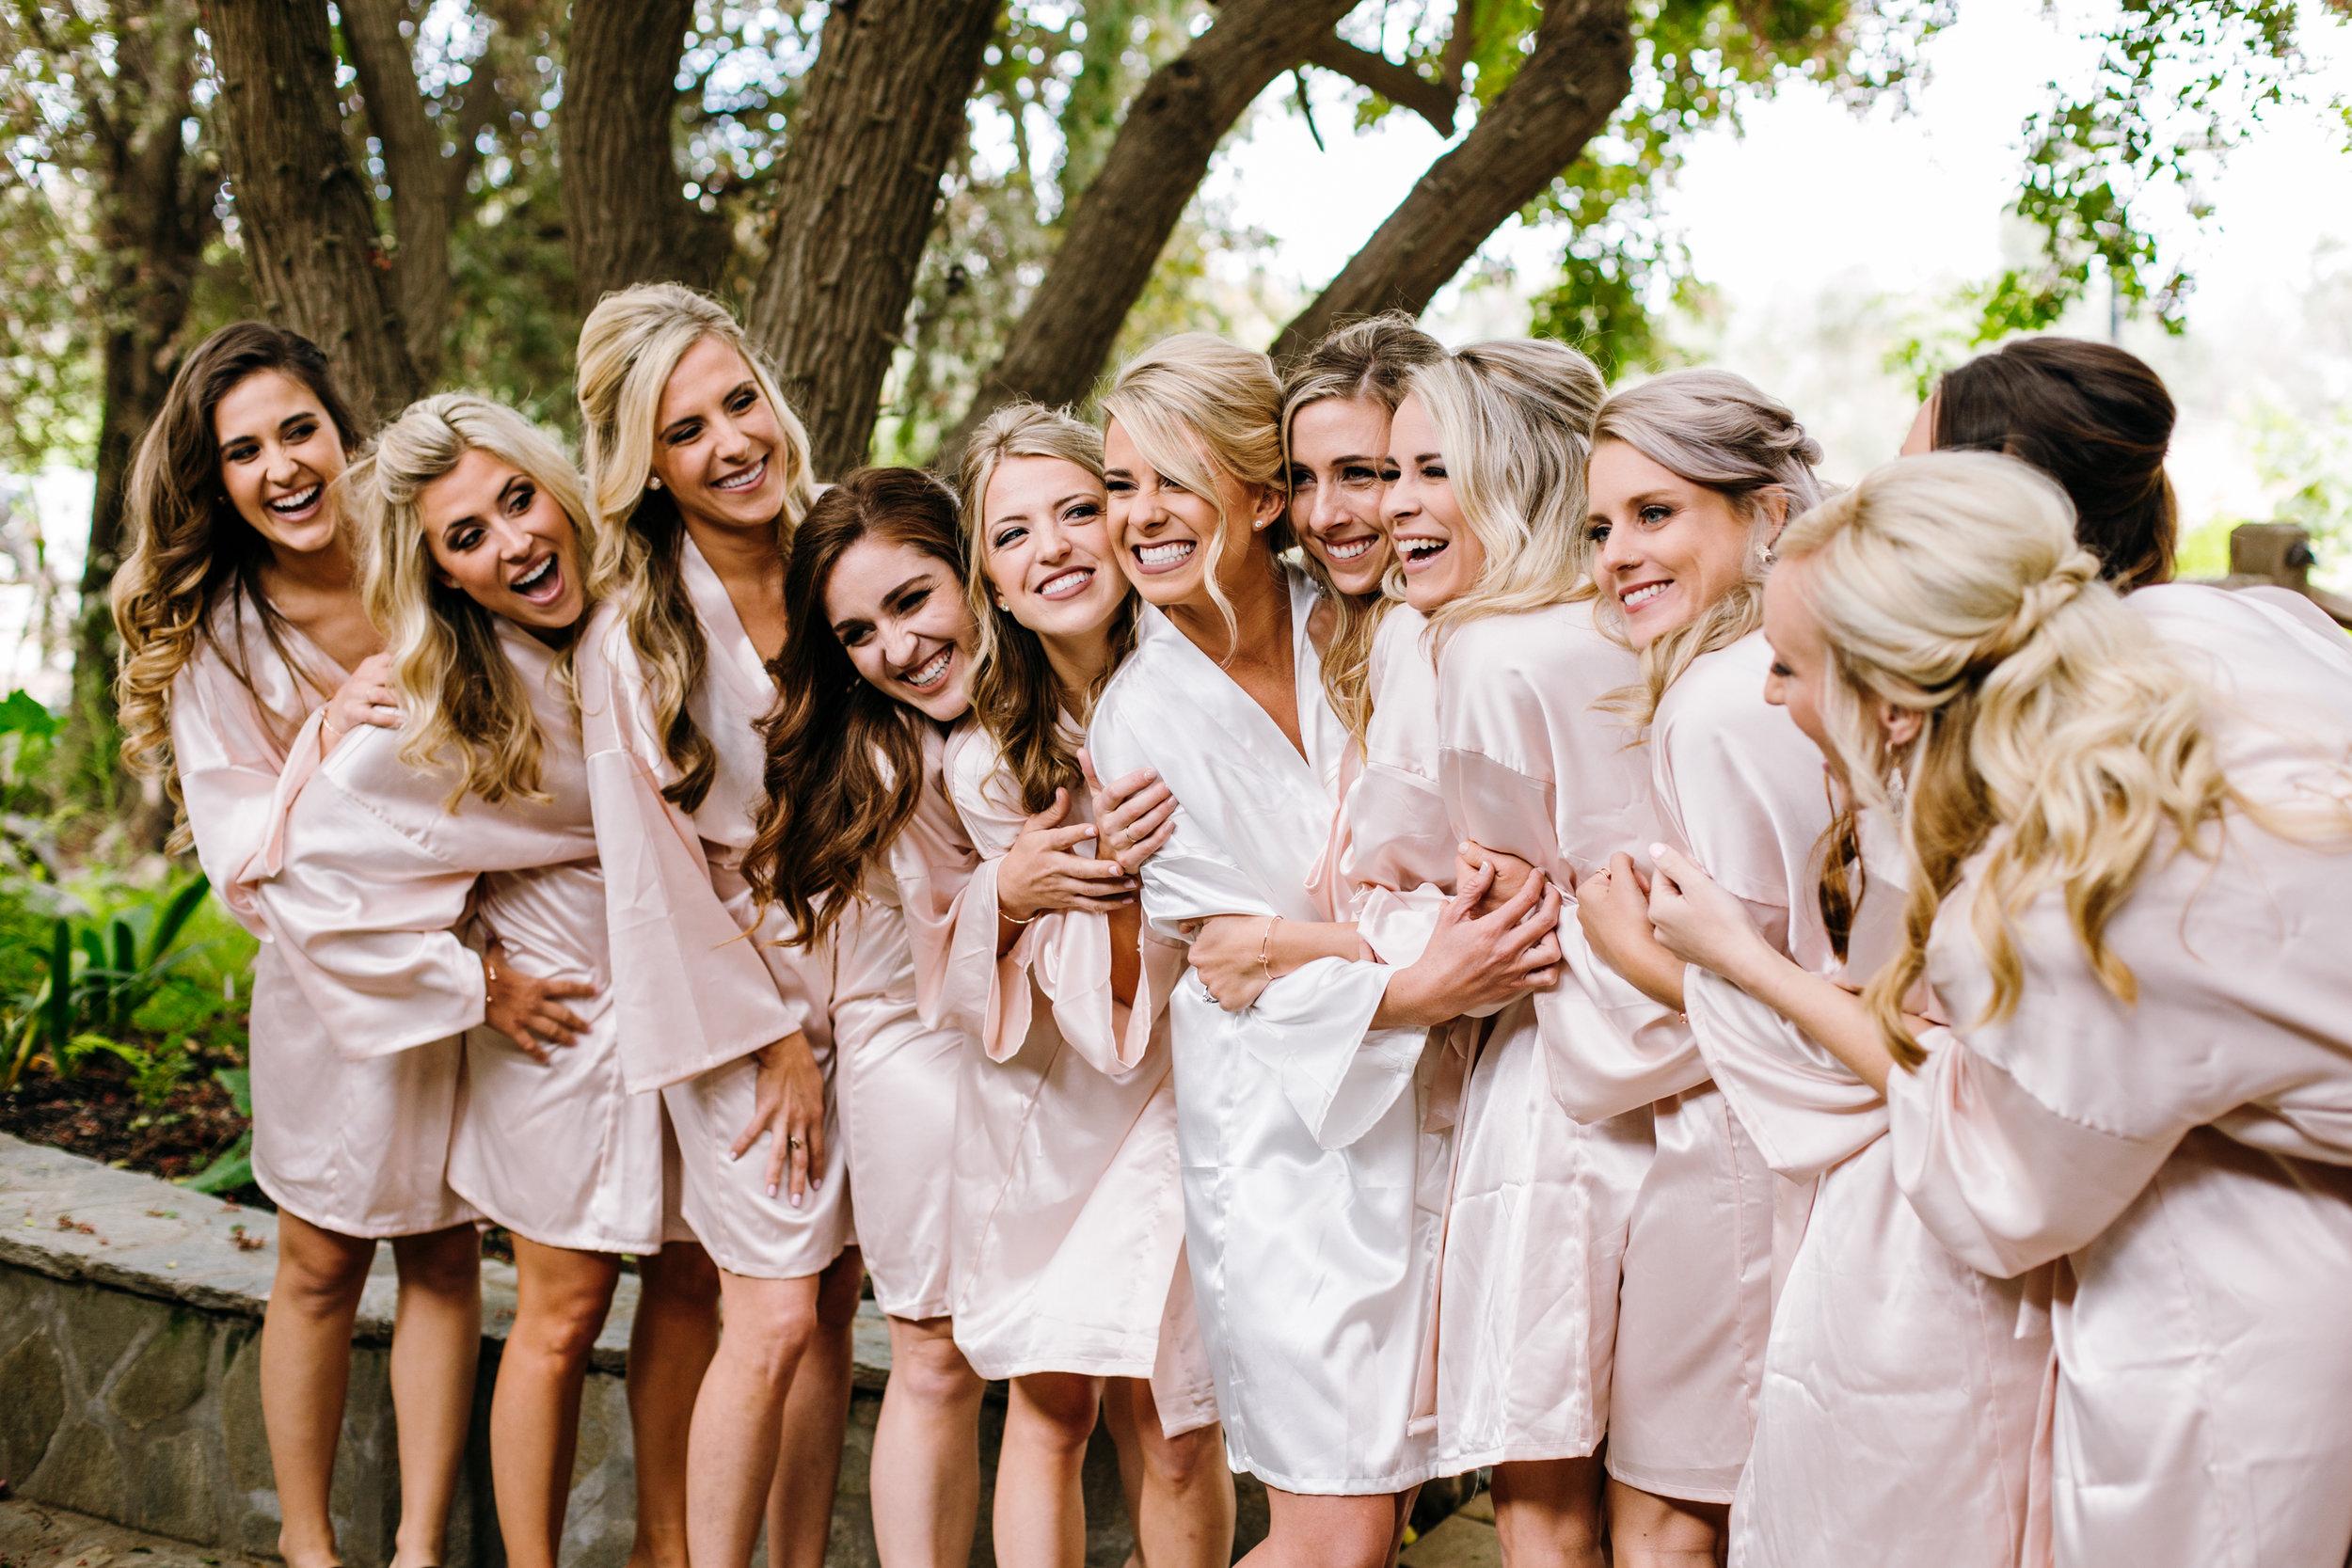 KaraNixonWeddings-LakeOakMeadows-Temecula-Wedding-7.jpg